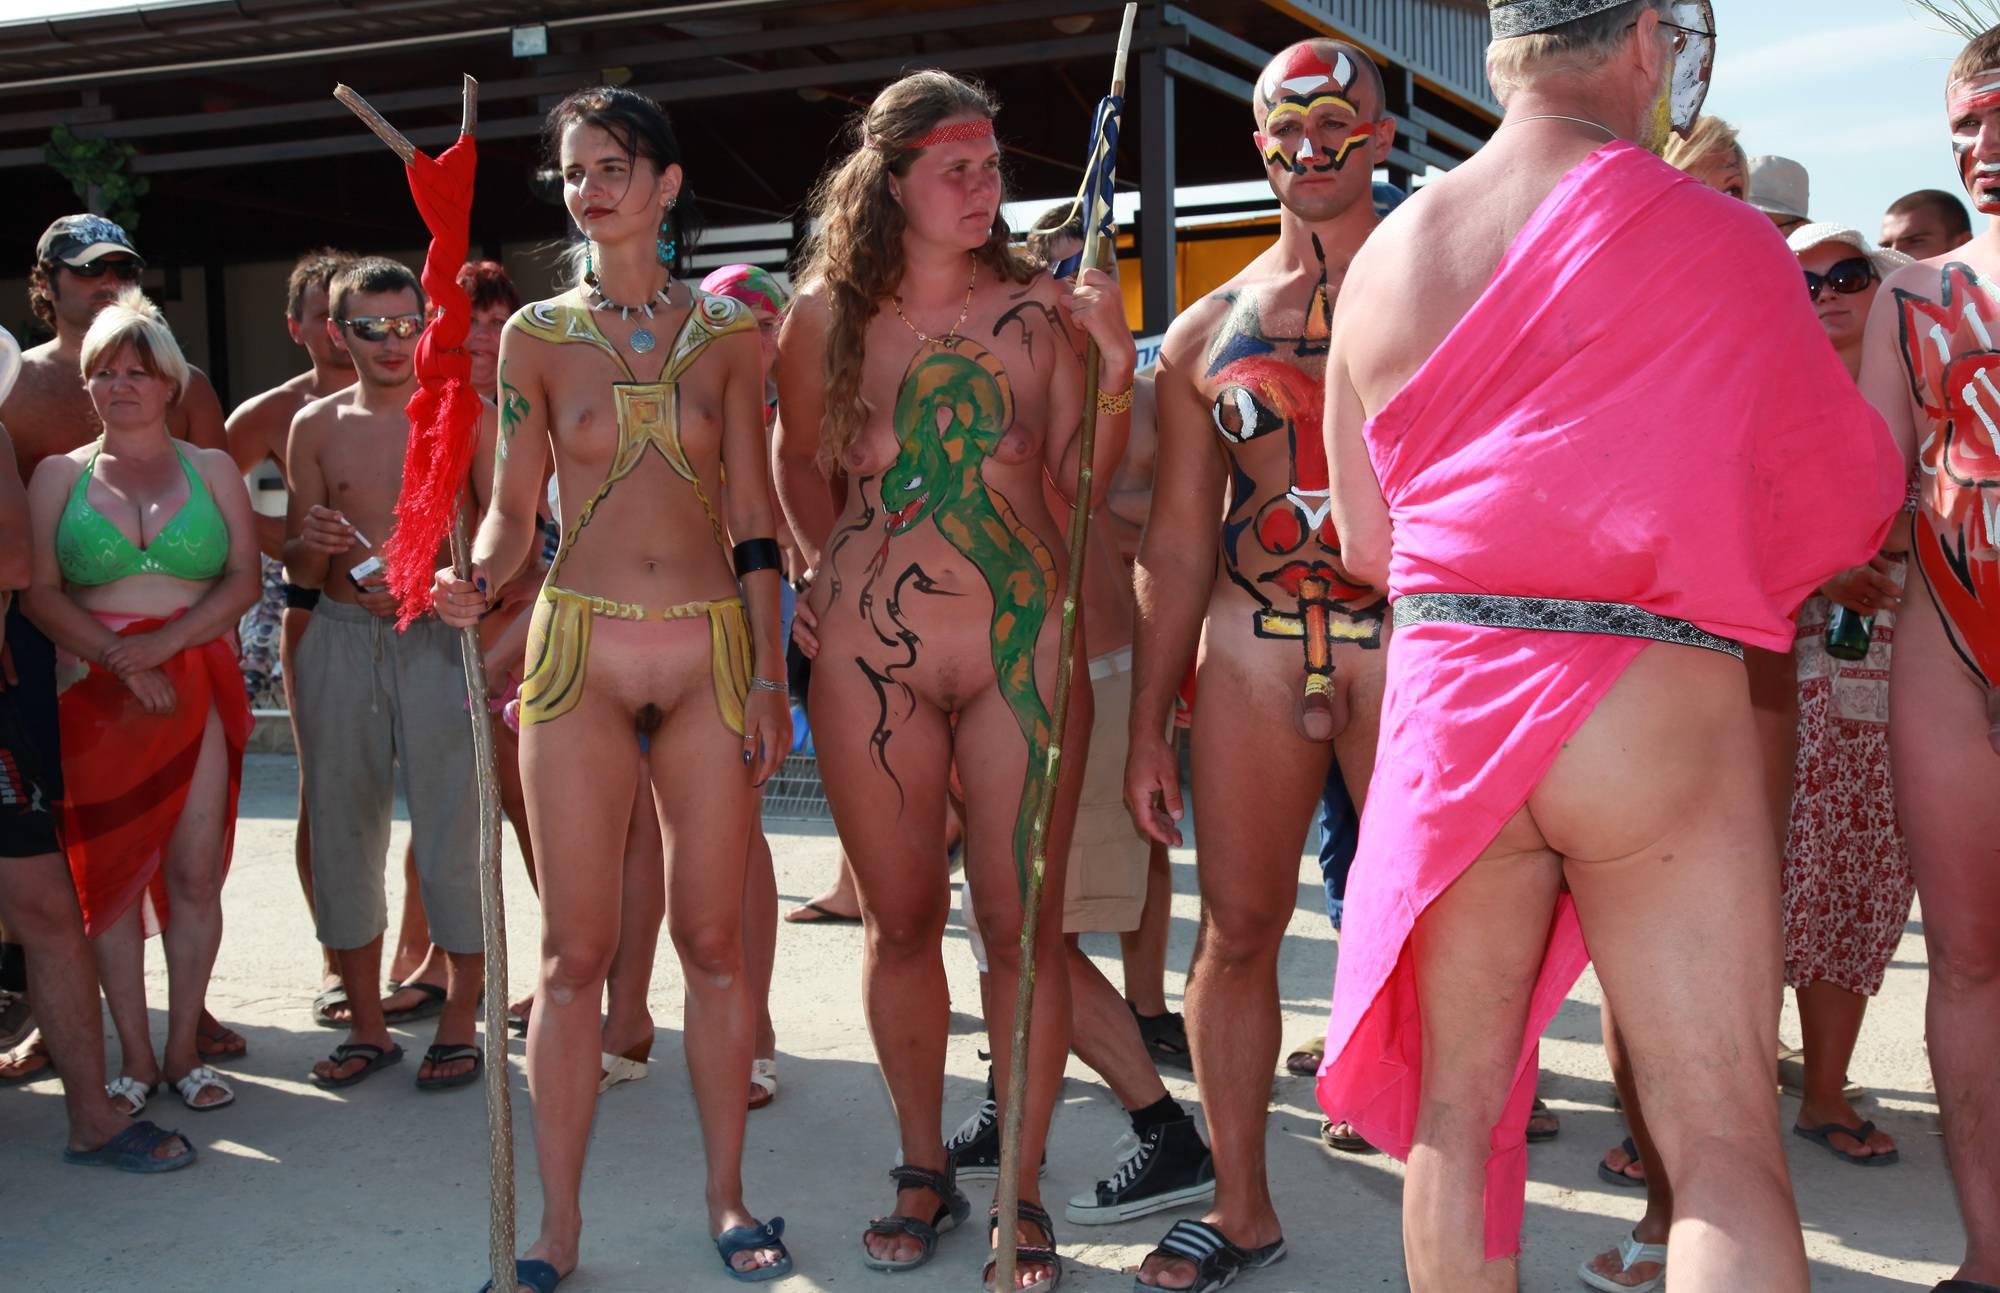 Nudist Gallery Neptune Bodypaint Lineup - 1